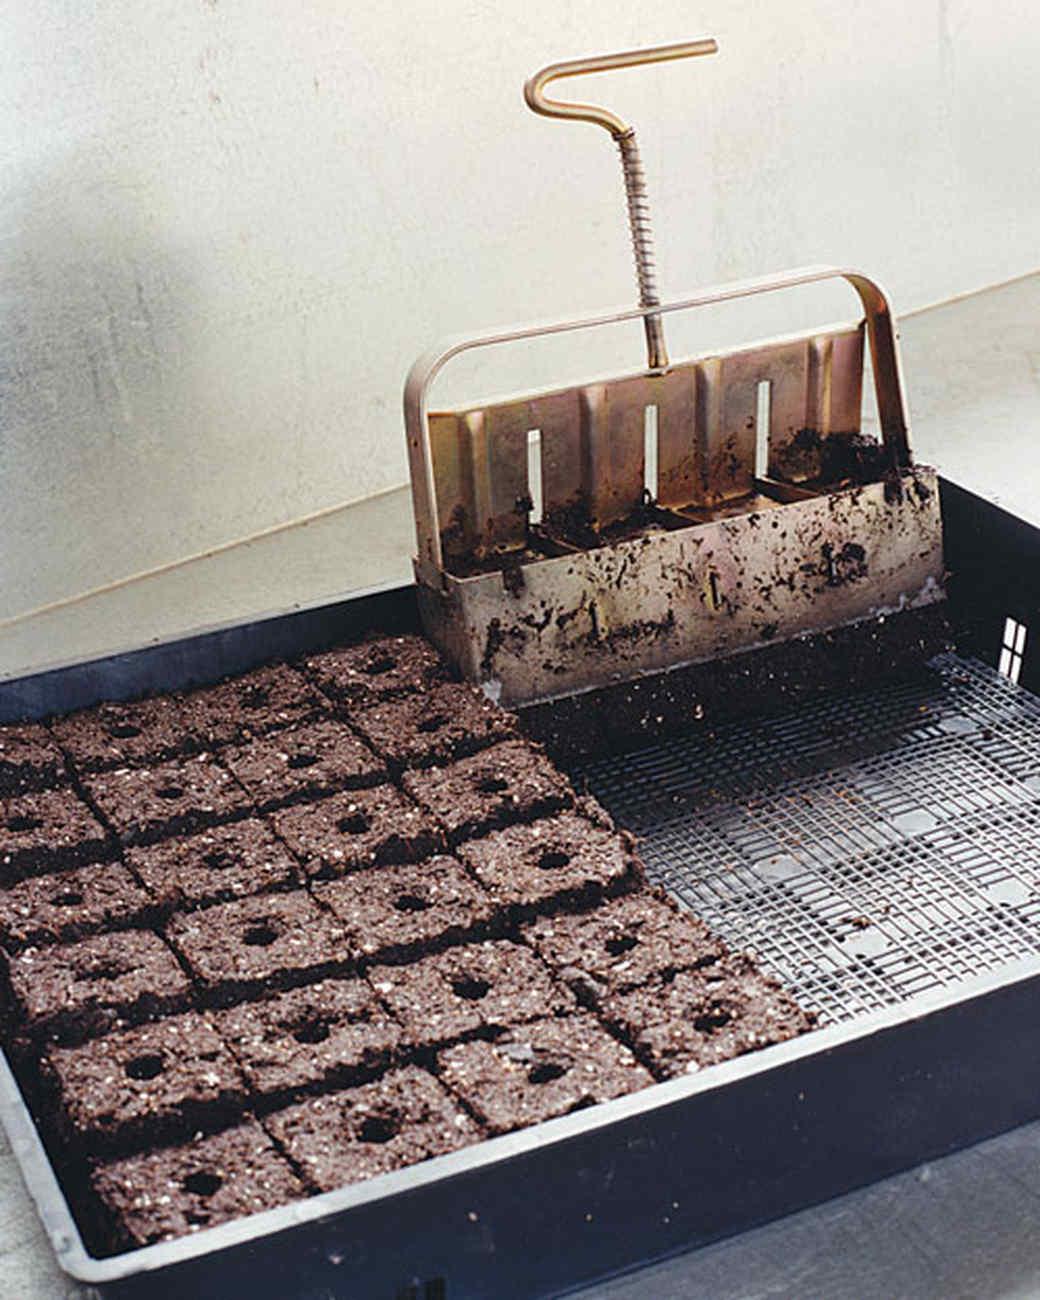 mla103111_0308_block_soil.jpg